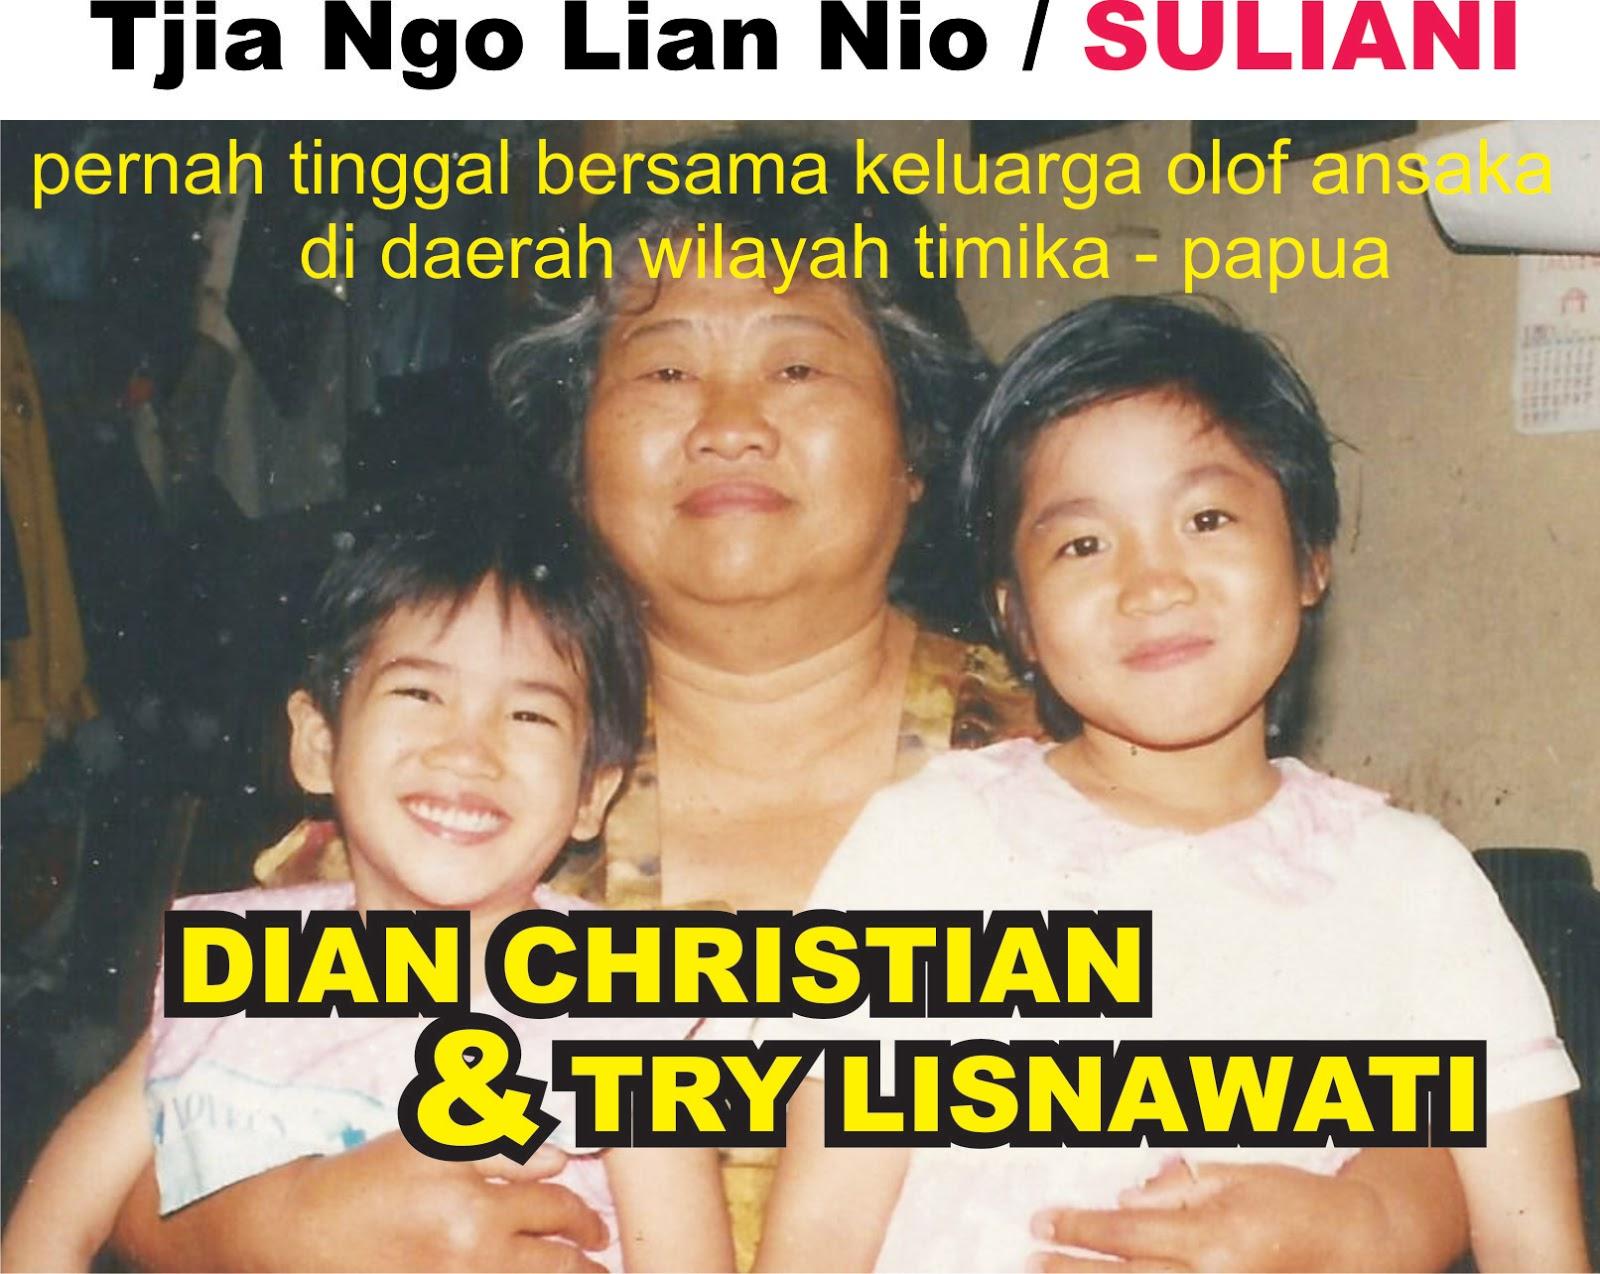 Anak hilang, Penculikan, E-KTP Ganda / ASPAL, Istri kabur, Ipar yg jahat, Timika, Surabaya